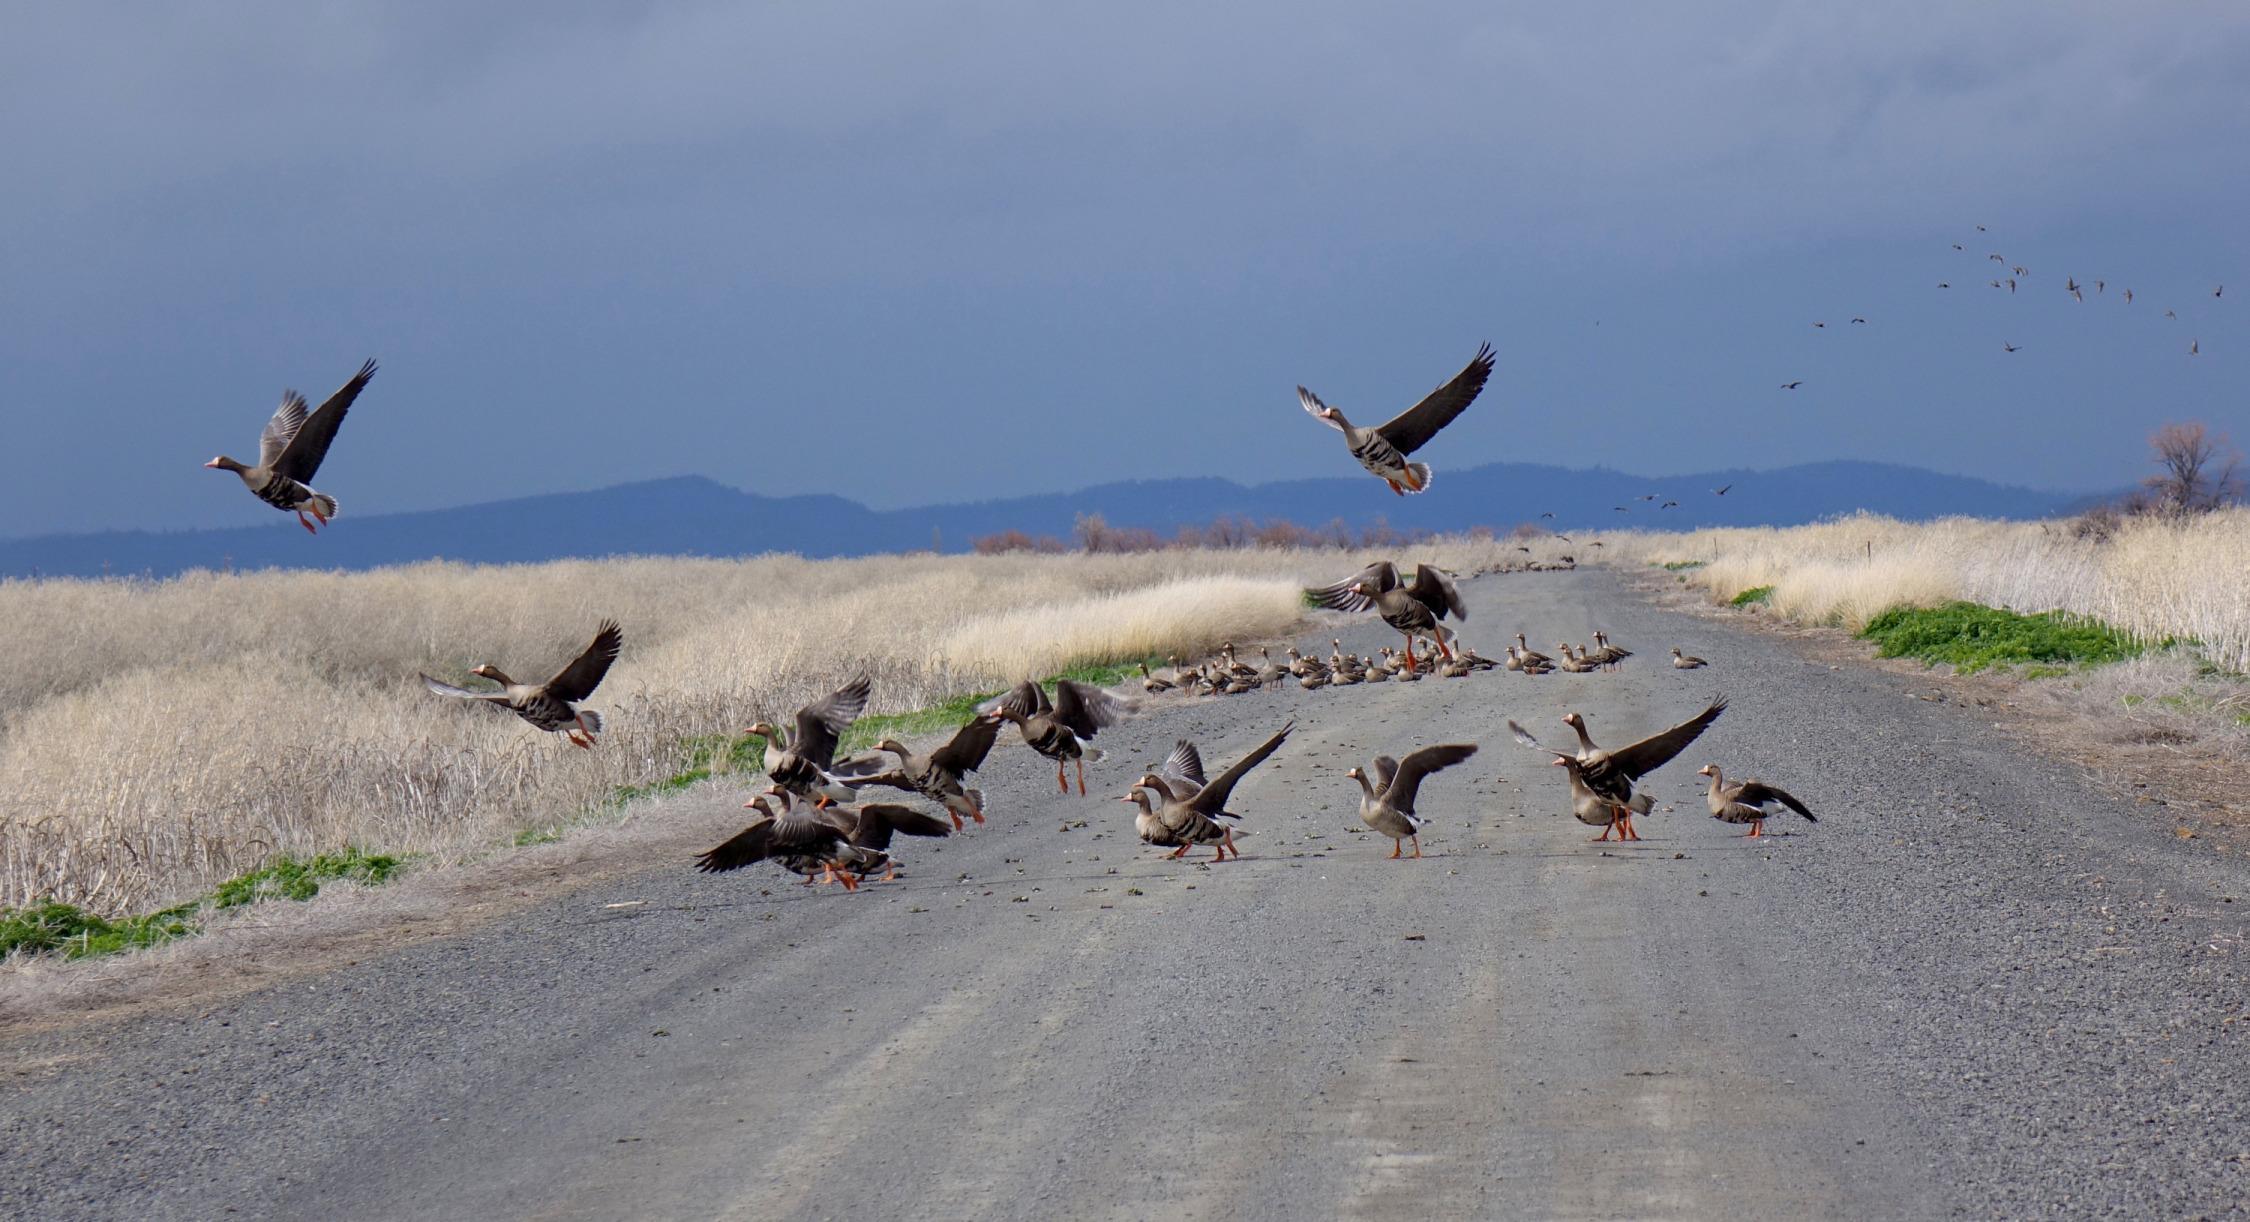 White fronted geese take flight on Lower Klamath National Wildlife Refuge.